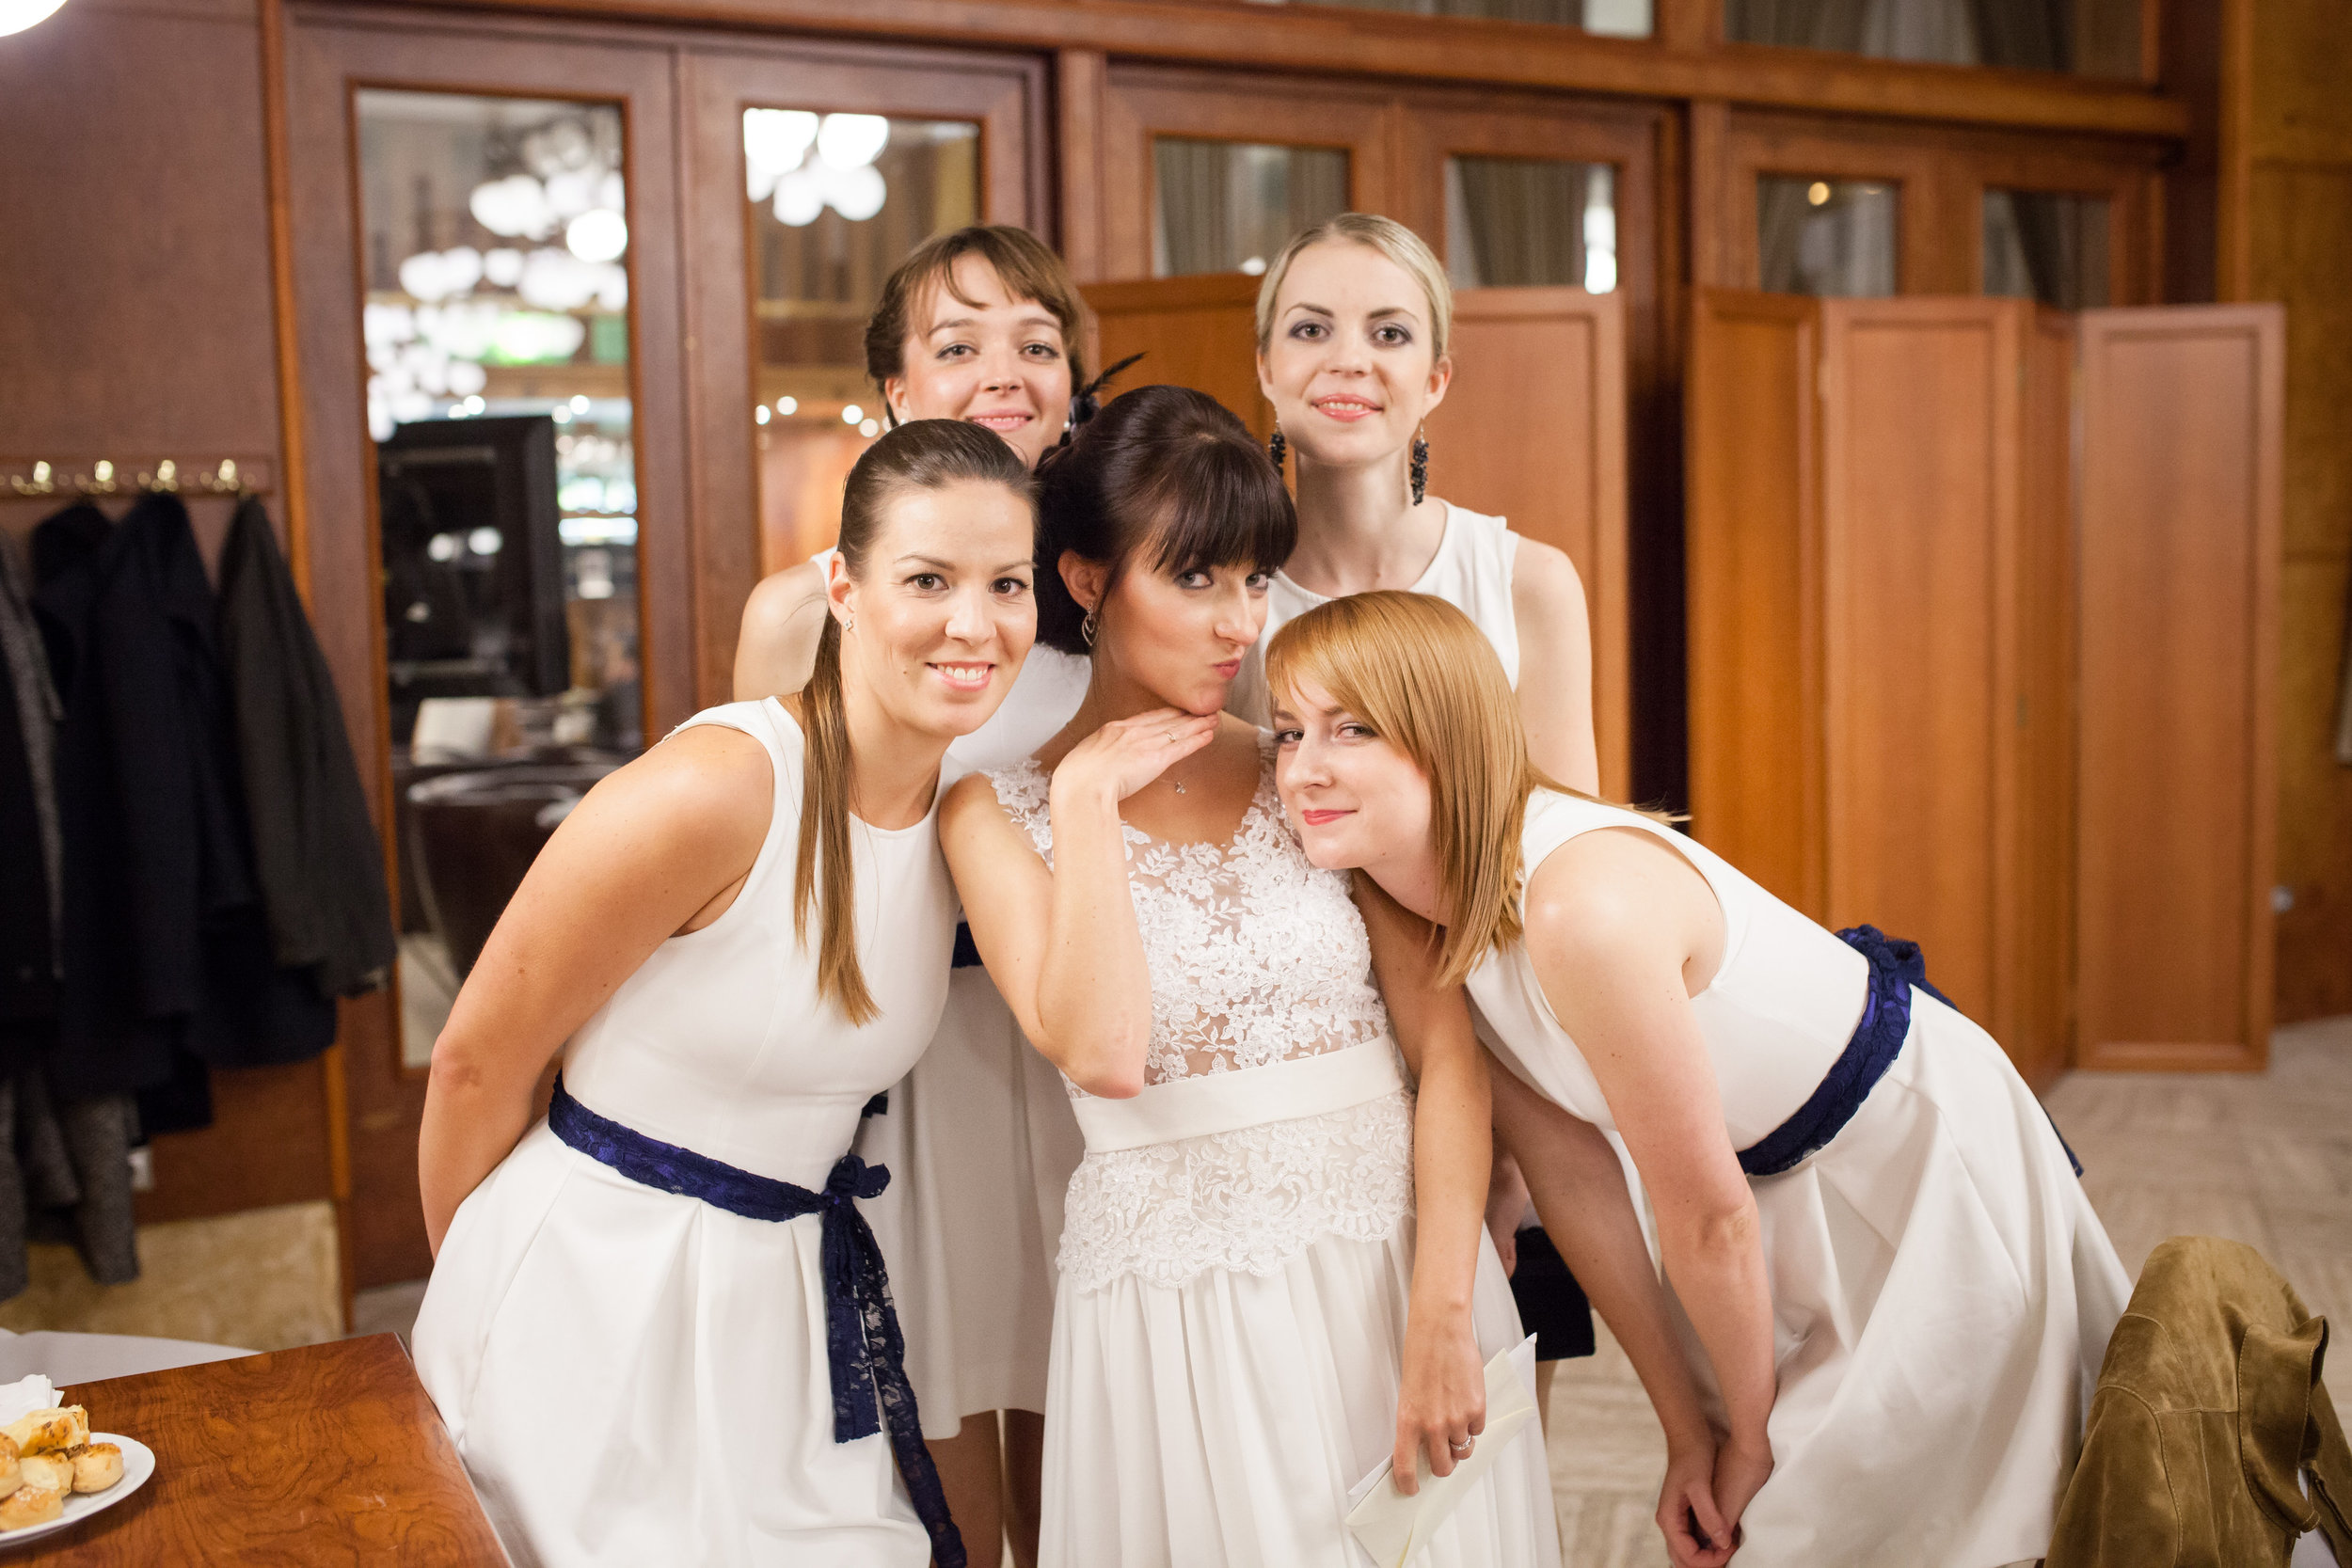 destination-wedding-photographer-slovakia-bratislava-reception-hotel-devin-bridesmaids-fun.jpg